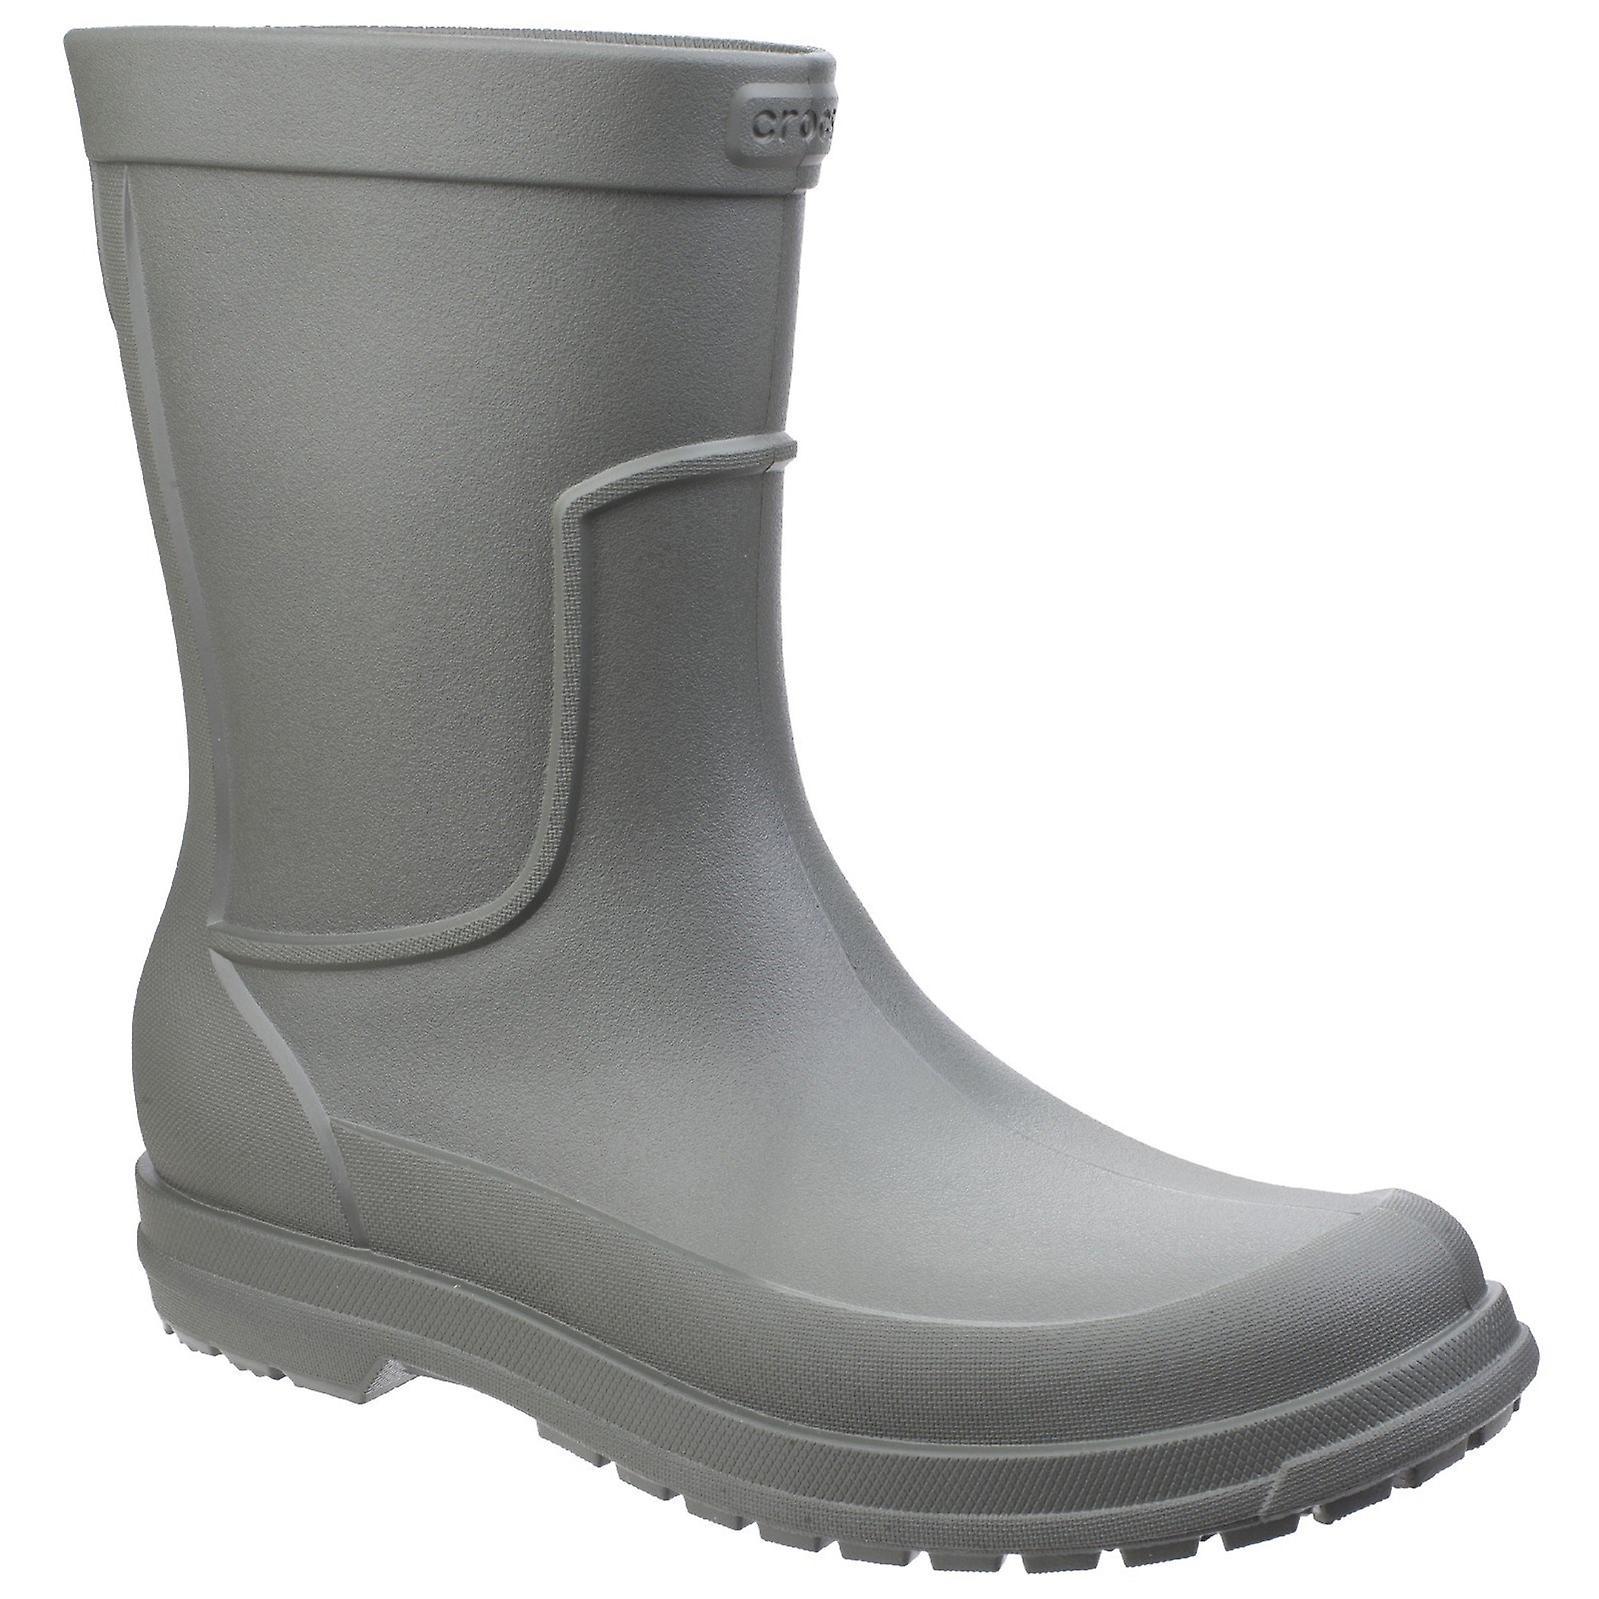 Crocs Mens Allcast Regn Støvler